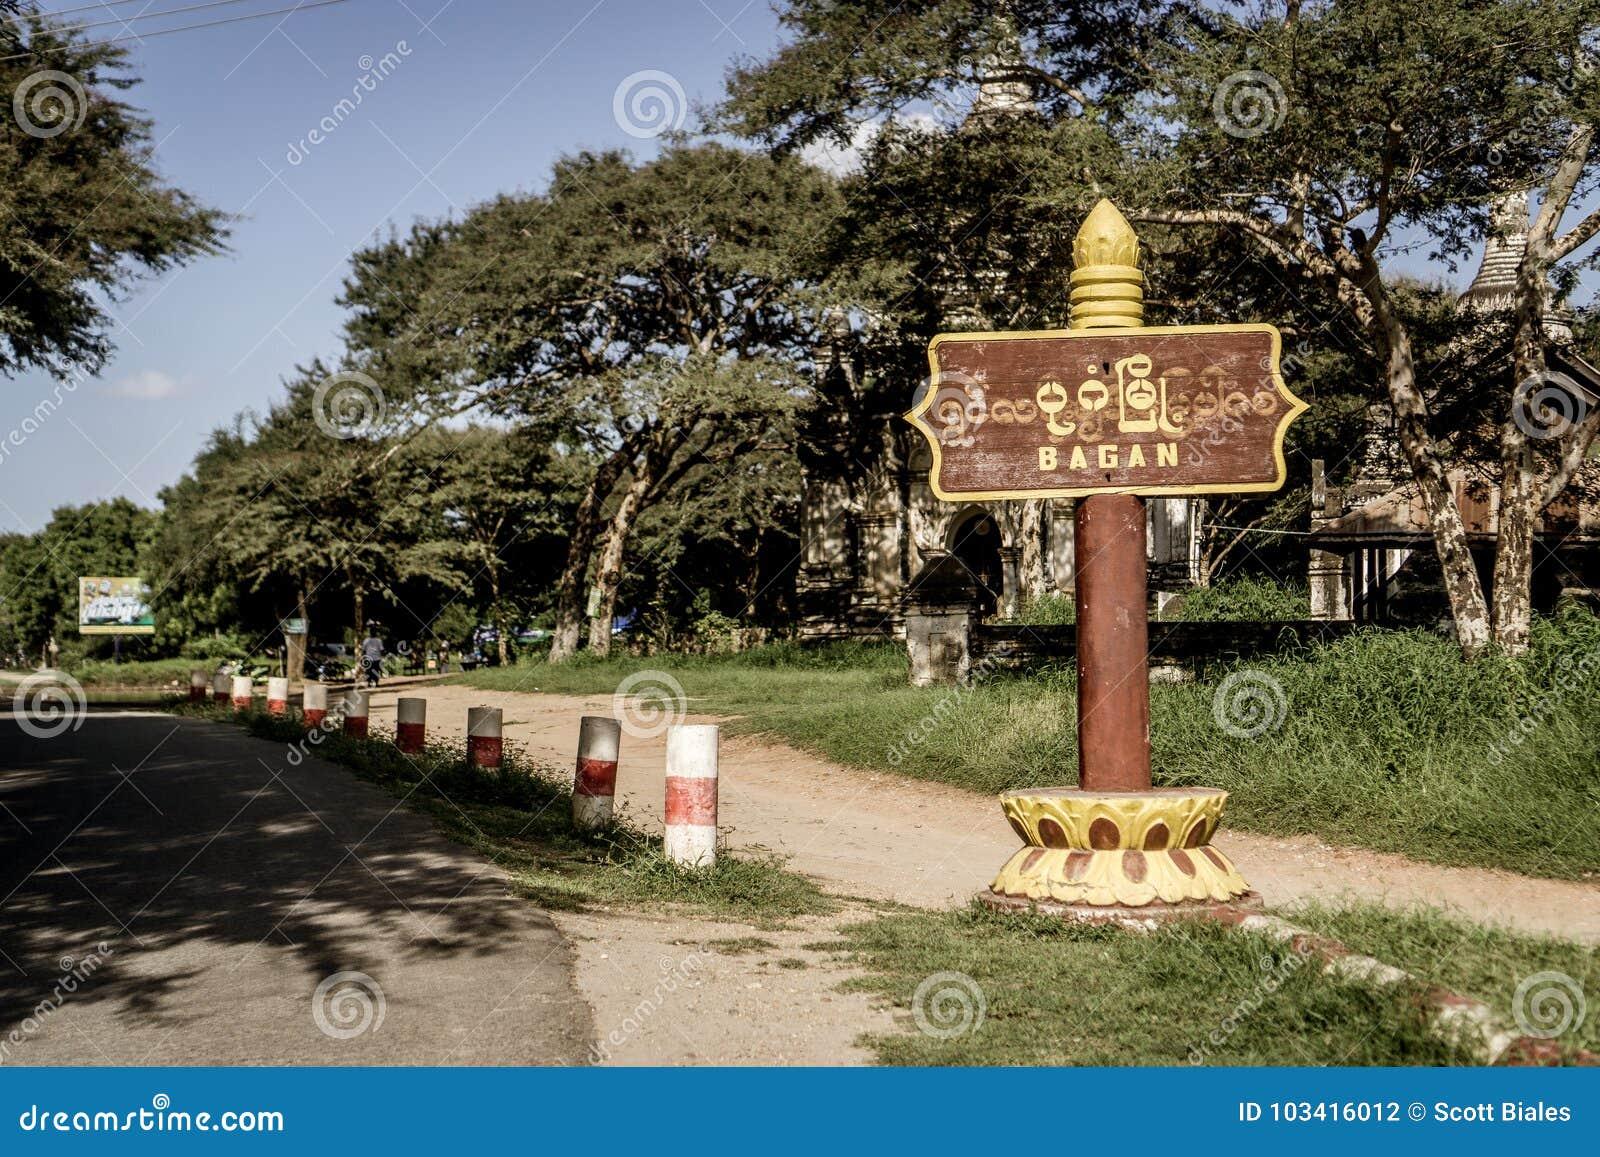 Bagan, Myanmar stock photo  Image of entrance, myanmar